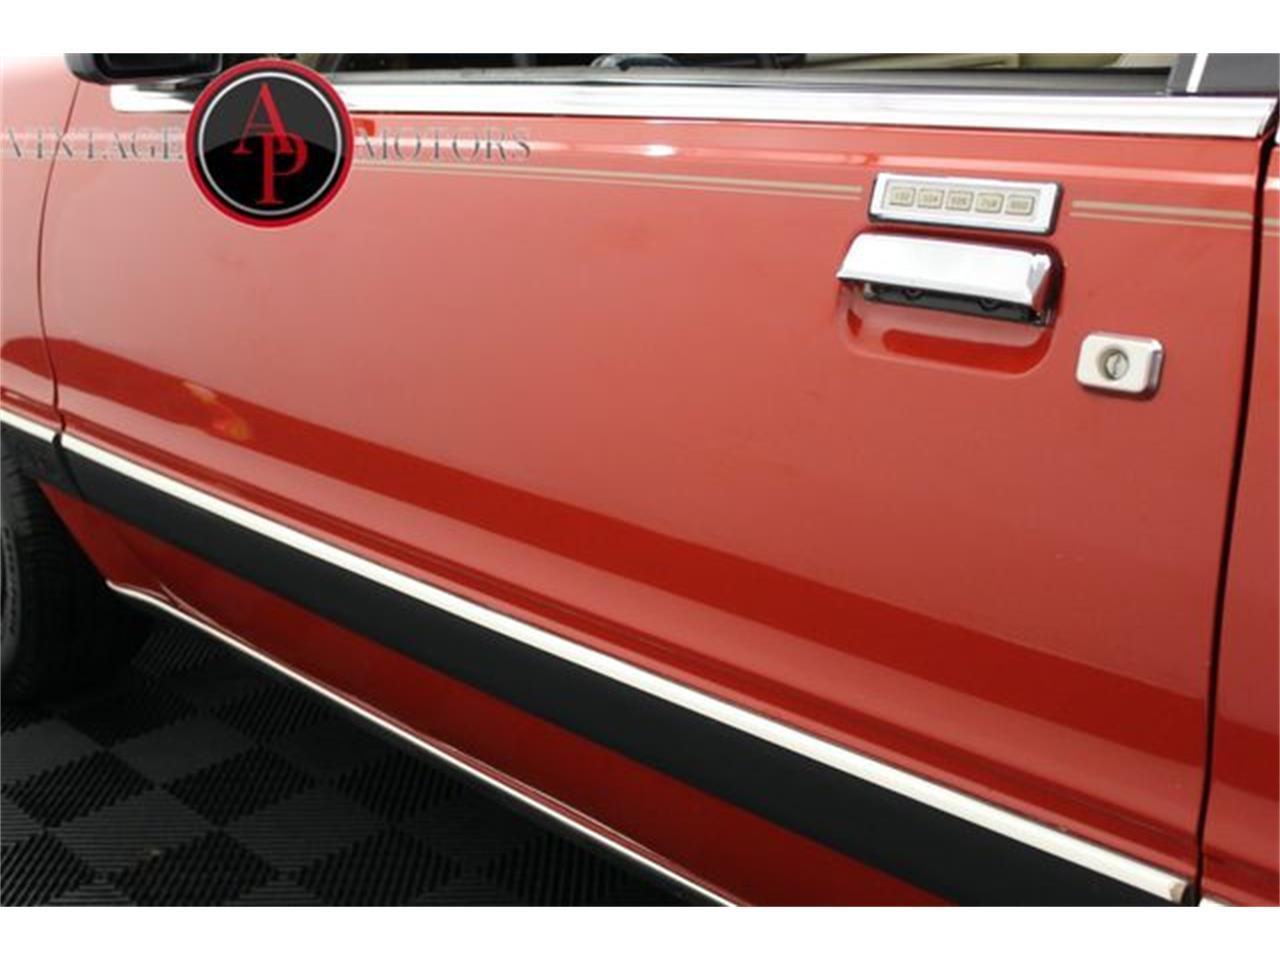 1986 Ford Thunderbird (CC-1391350) for sale in Statesville, North Carolina